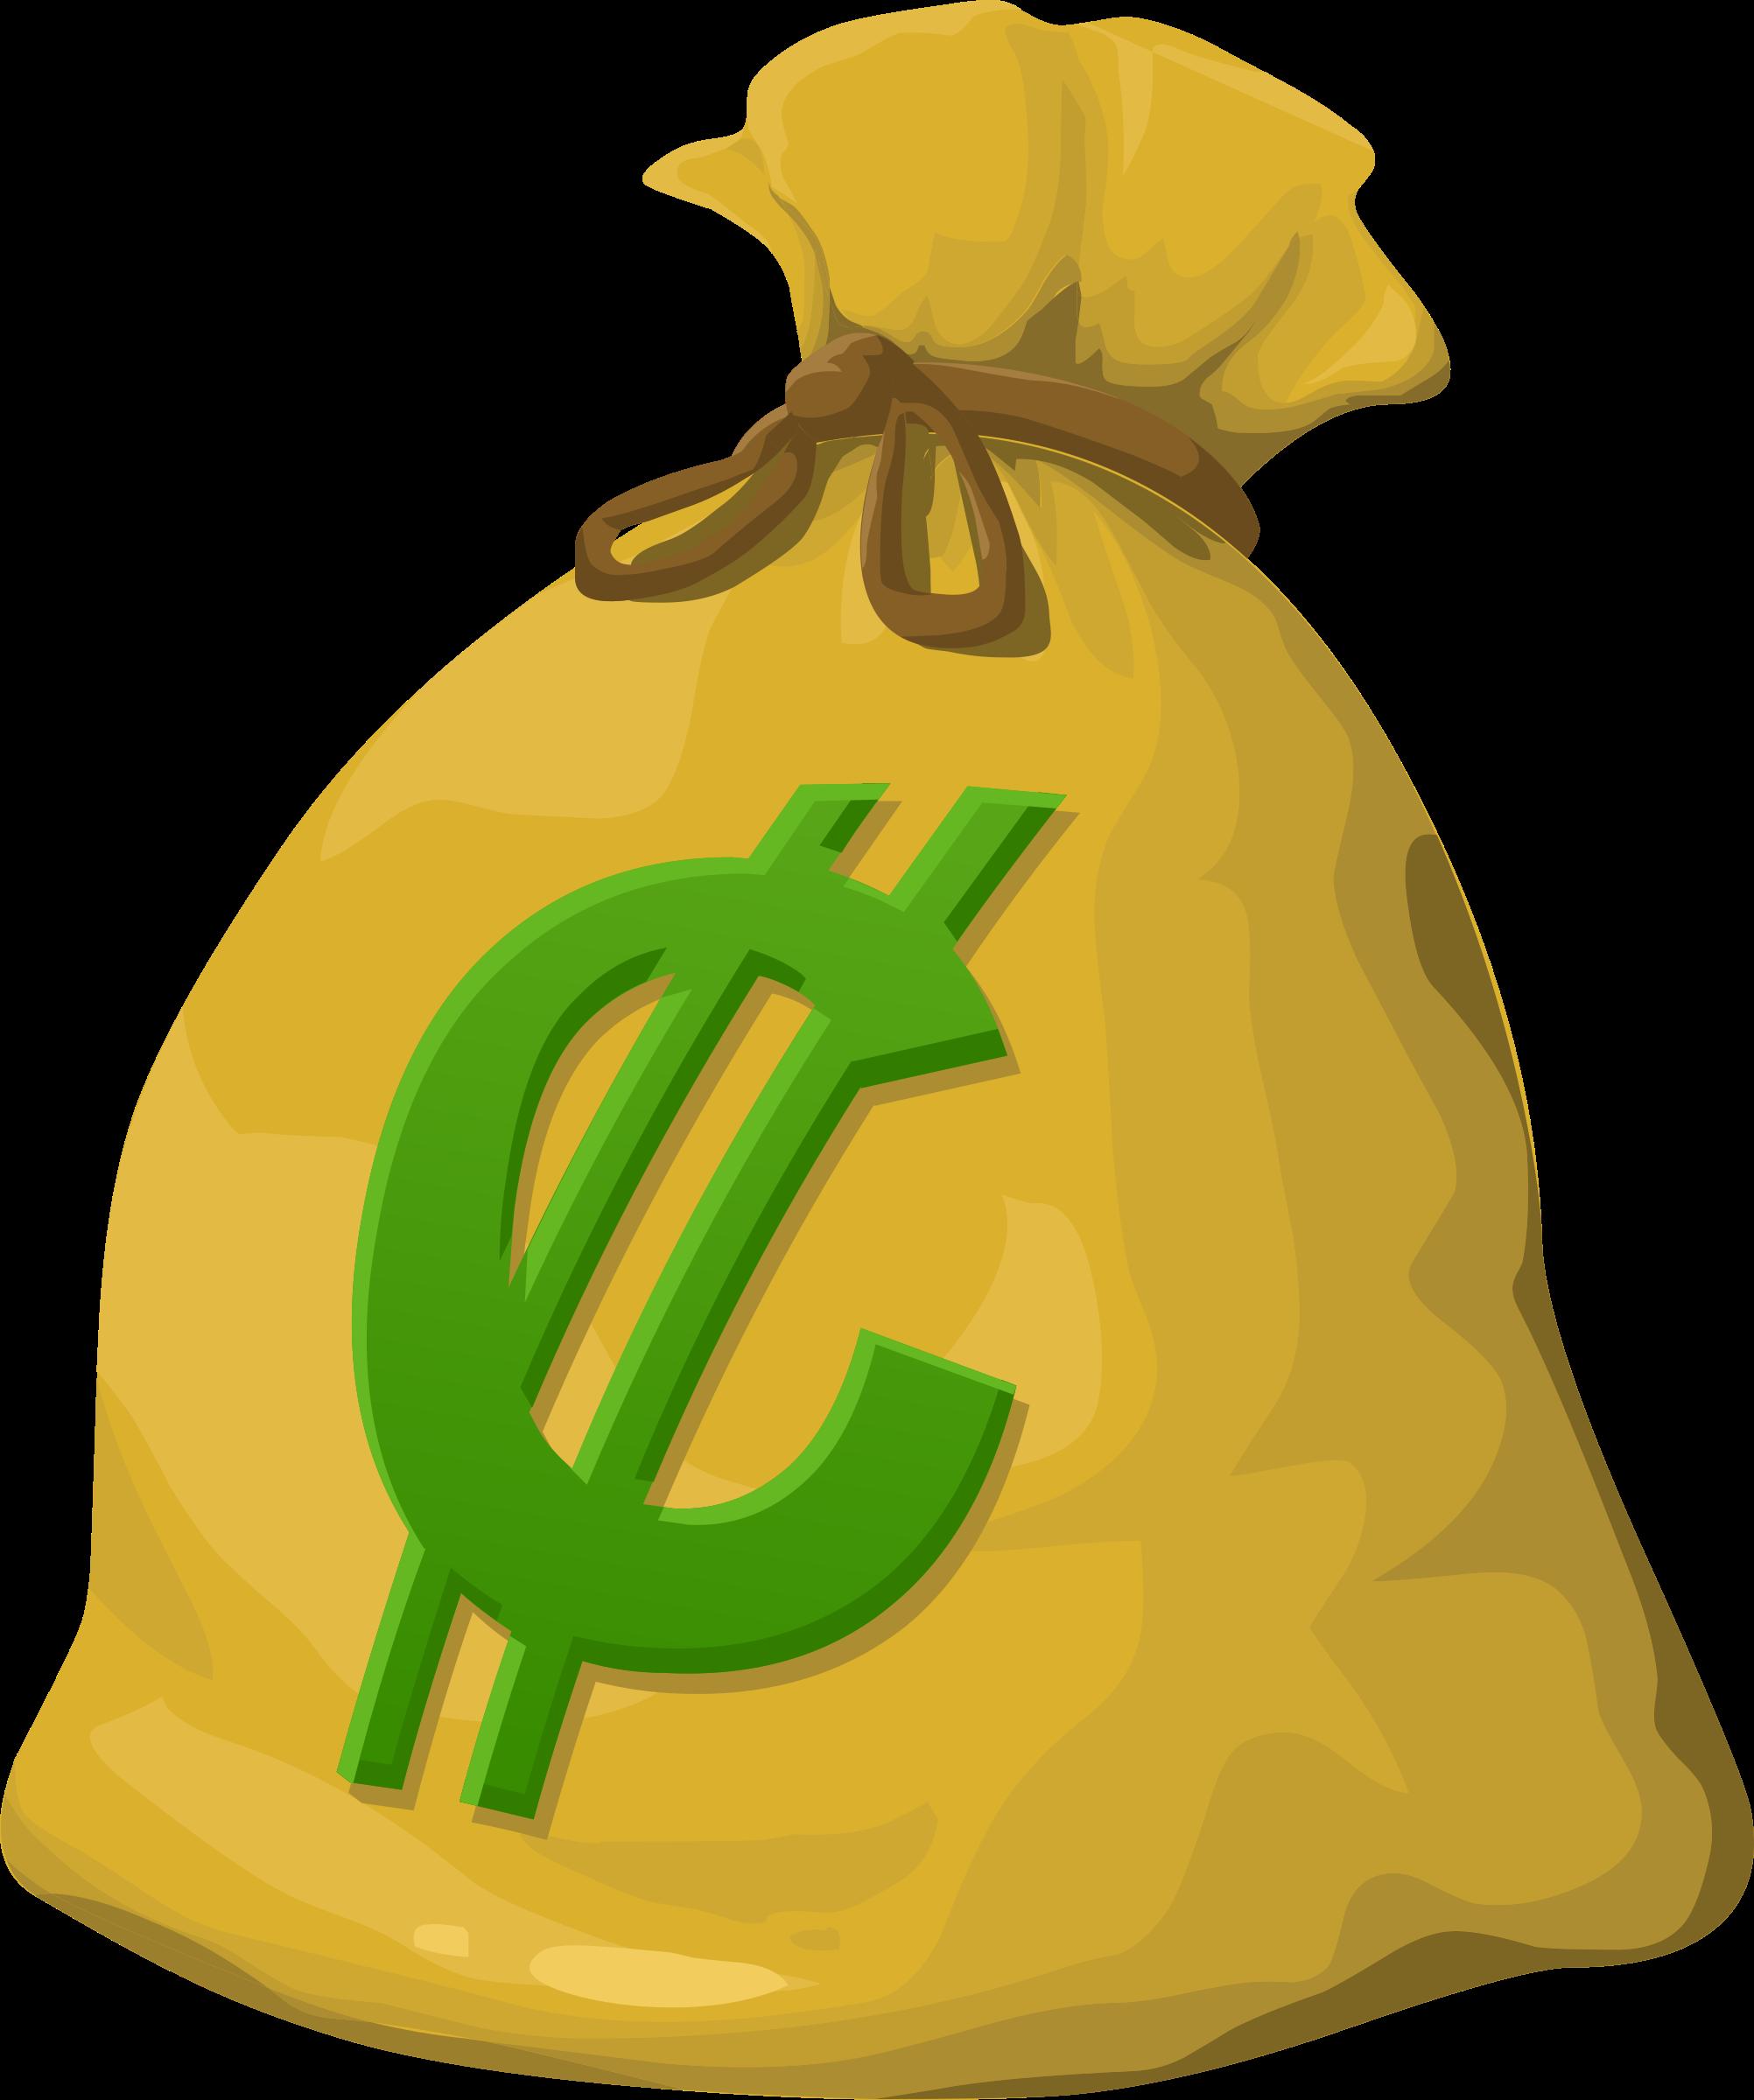 Misc money big image. R clipart gold bag